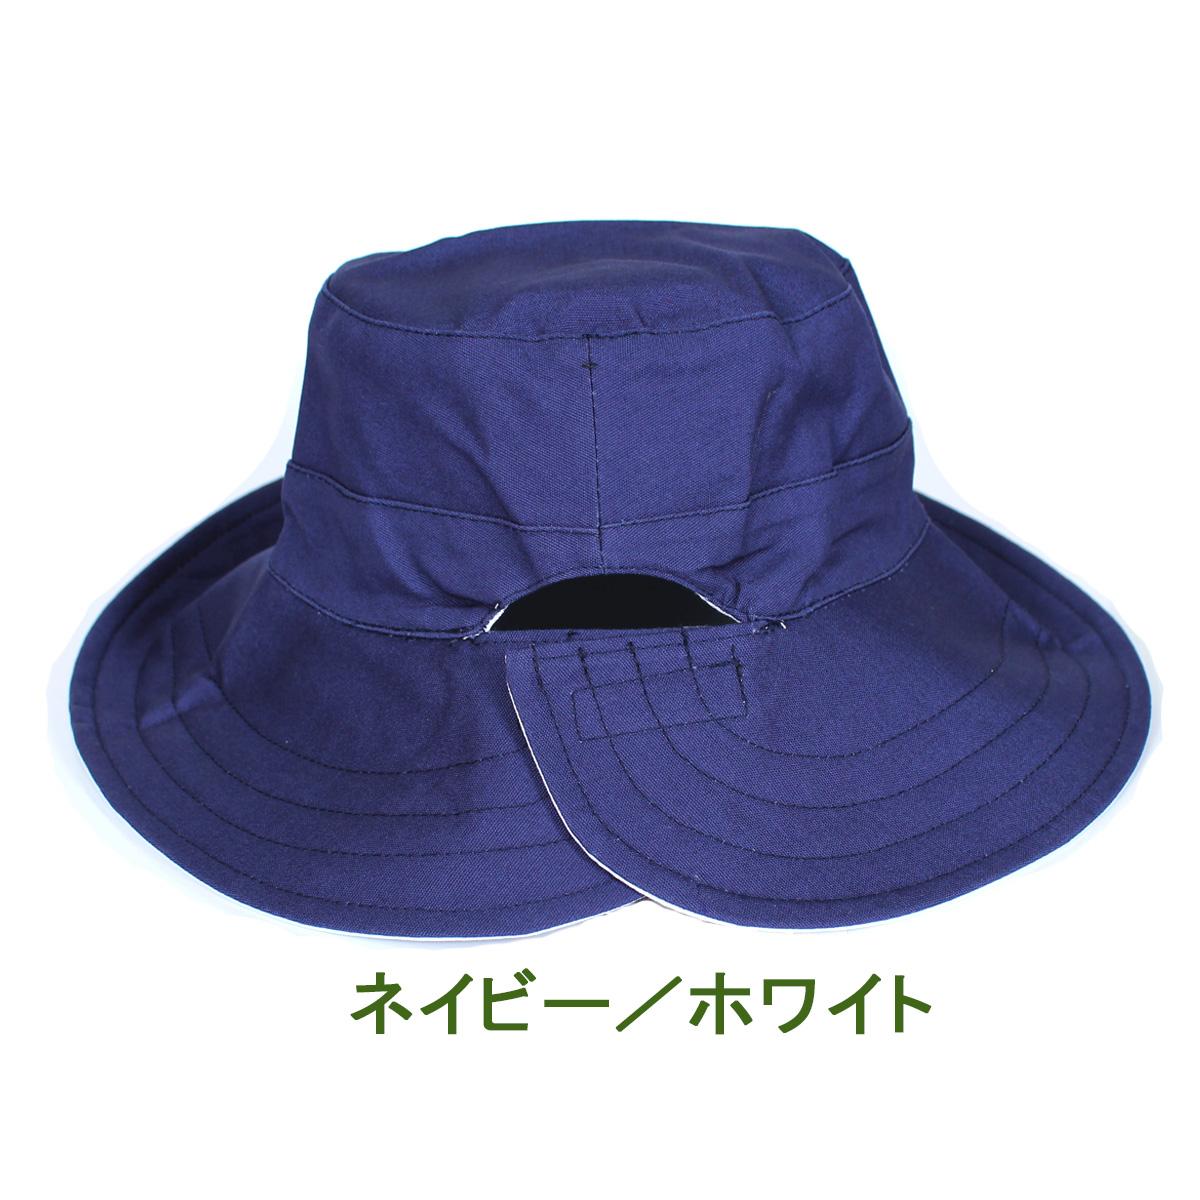 UV 切割妇女的帽子-妇女帽子帽子马尾辫妇女夏天帽子女士女士女士女性 * UV 紫外线 (UV) 最大值为 UPF 50 +